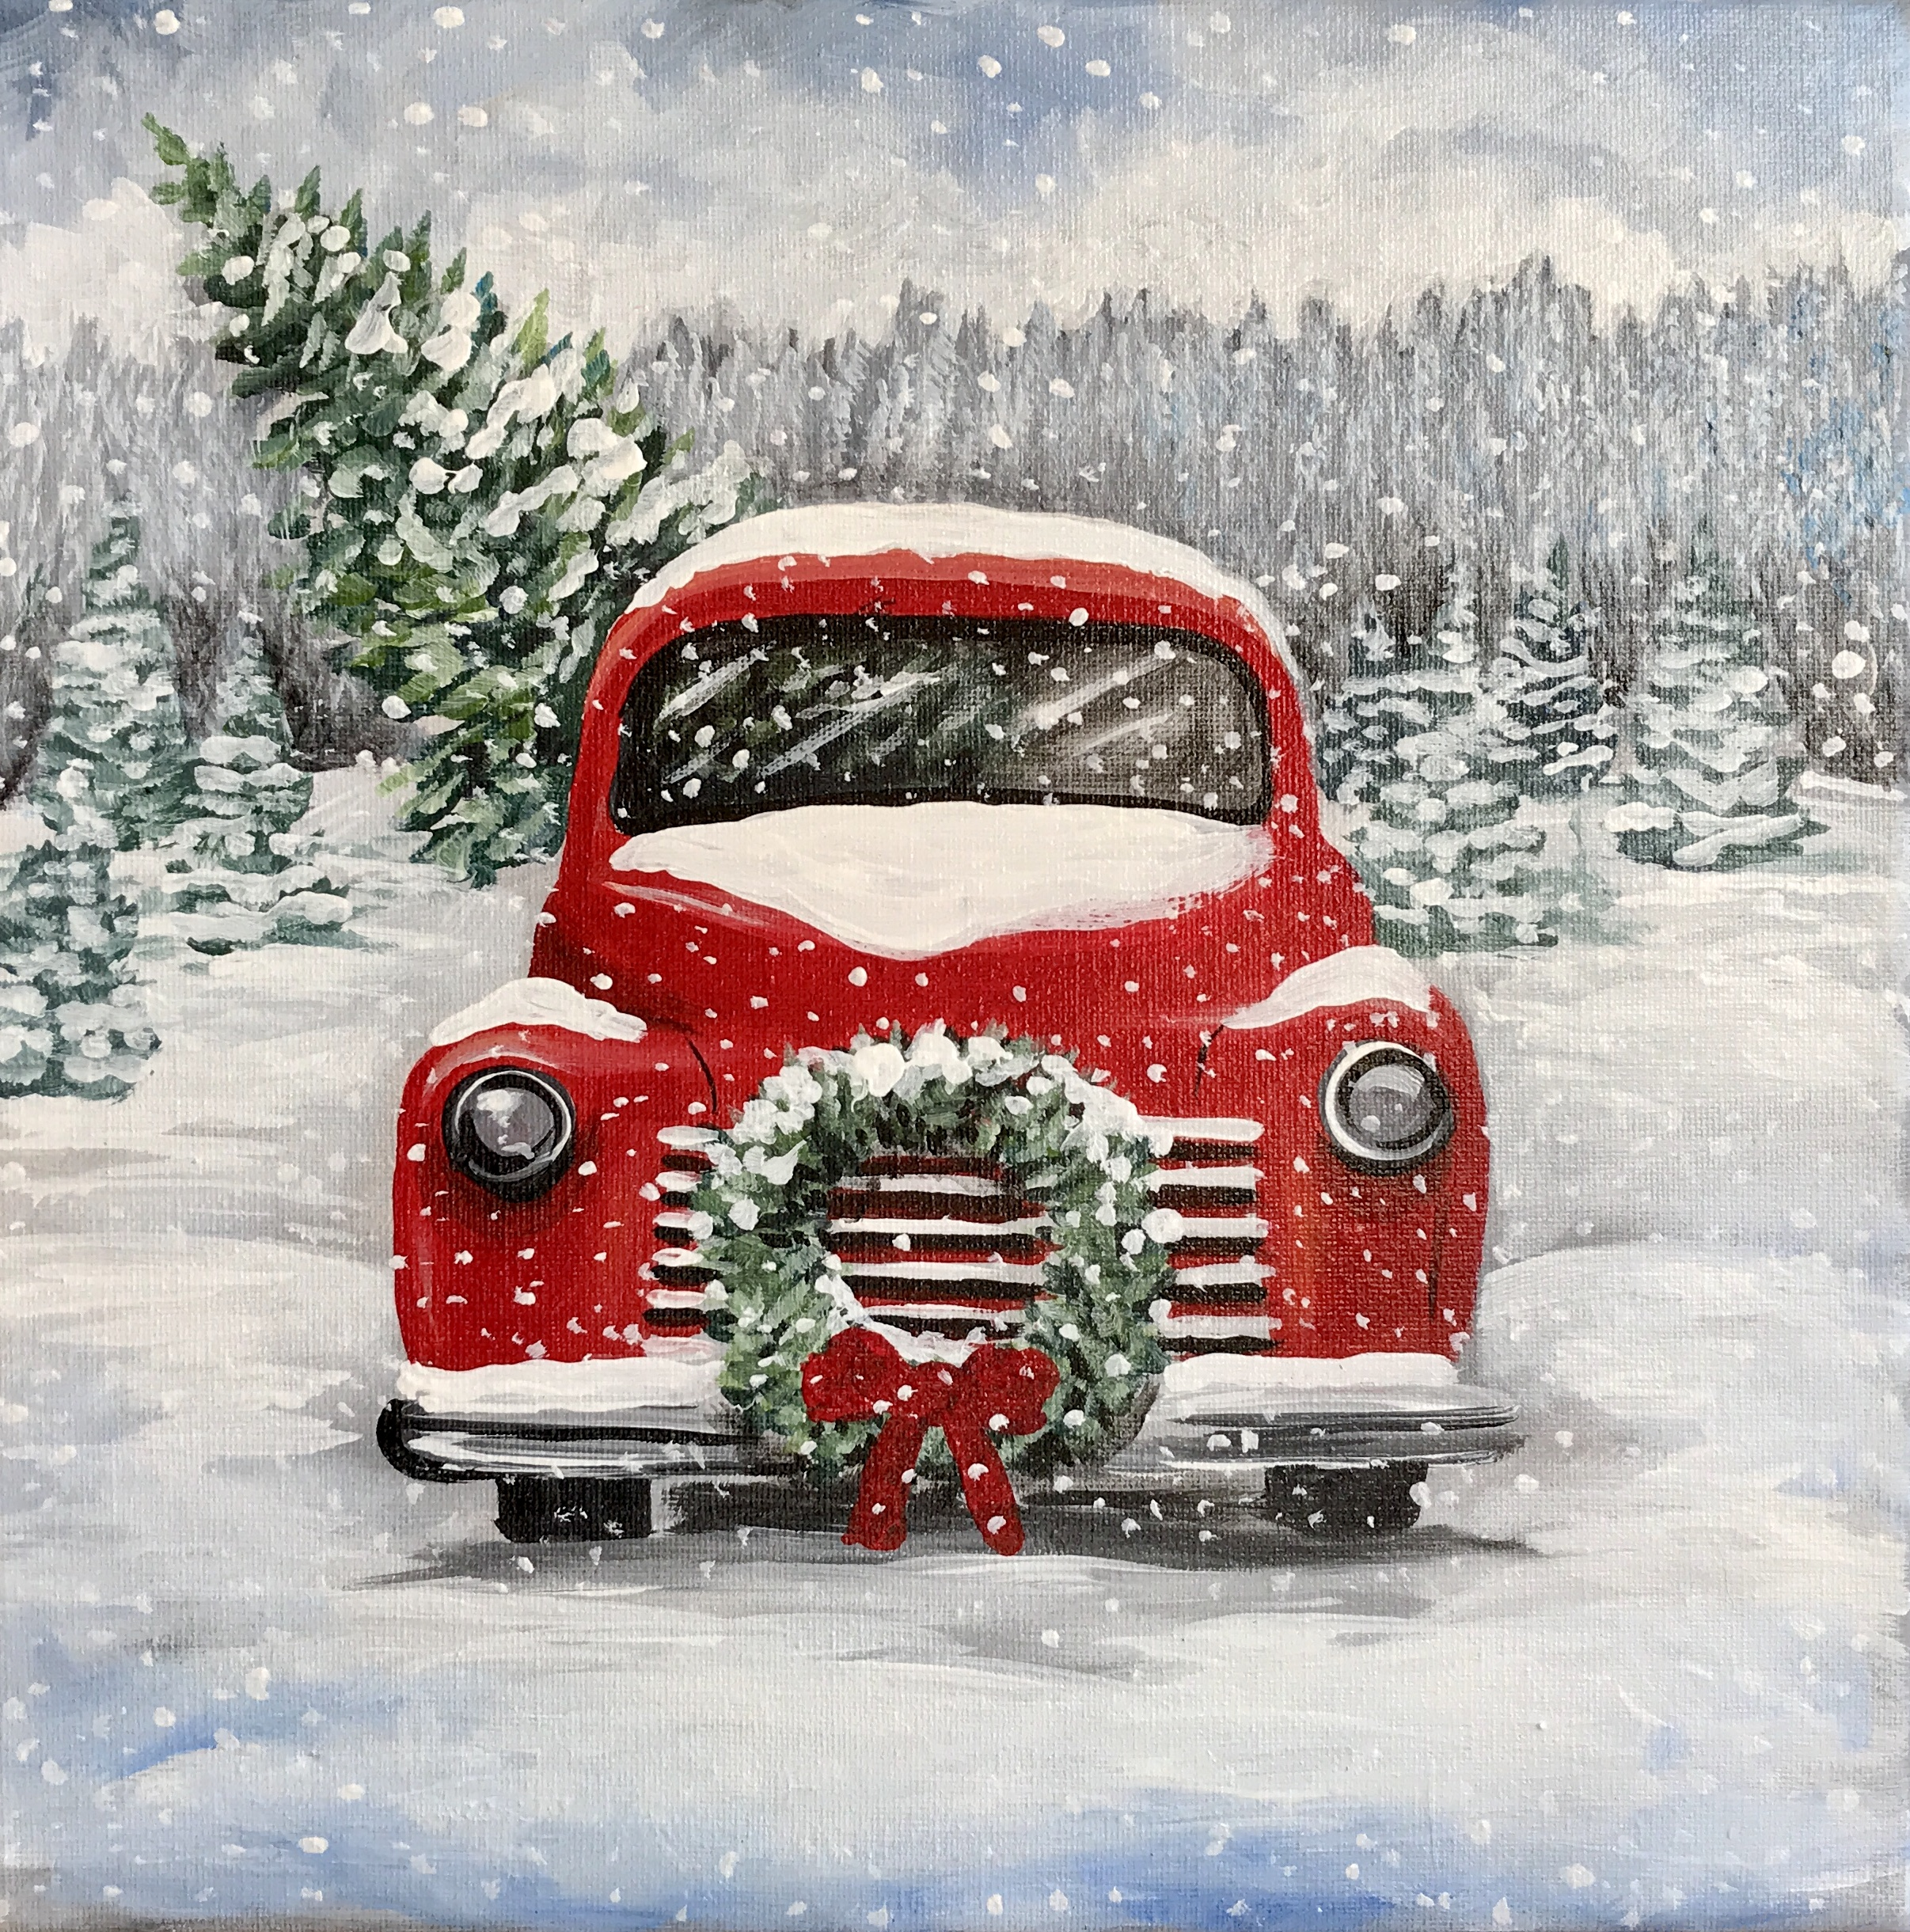 christmas in the country - Christmas In The Country